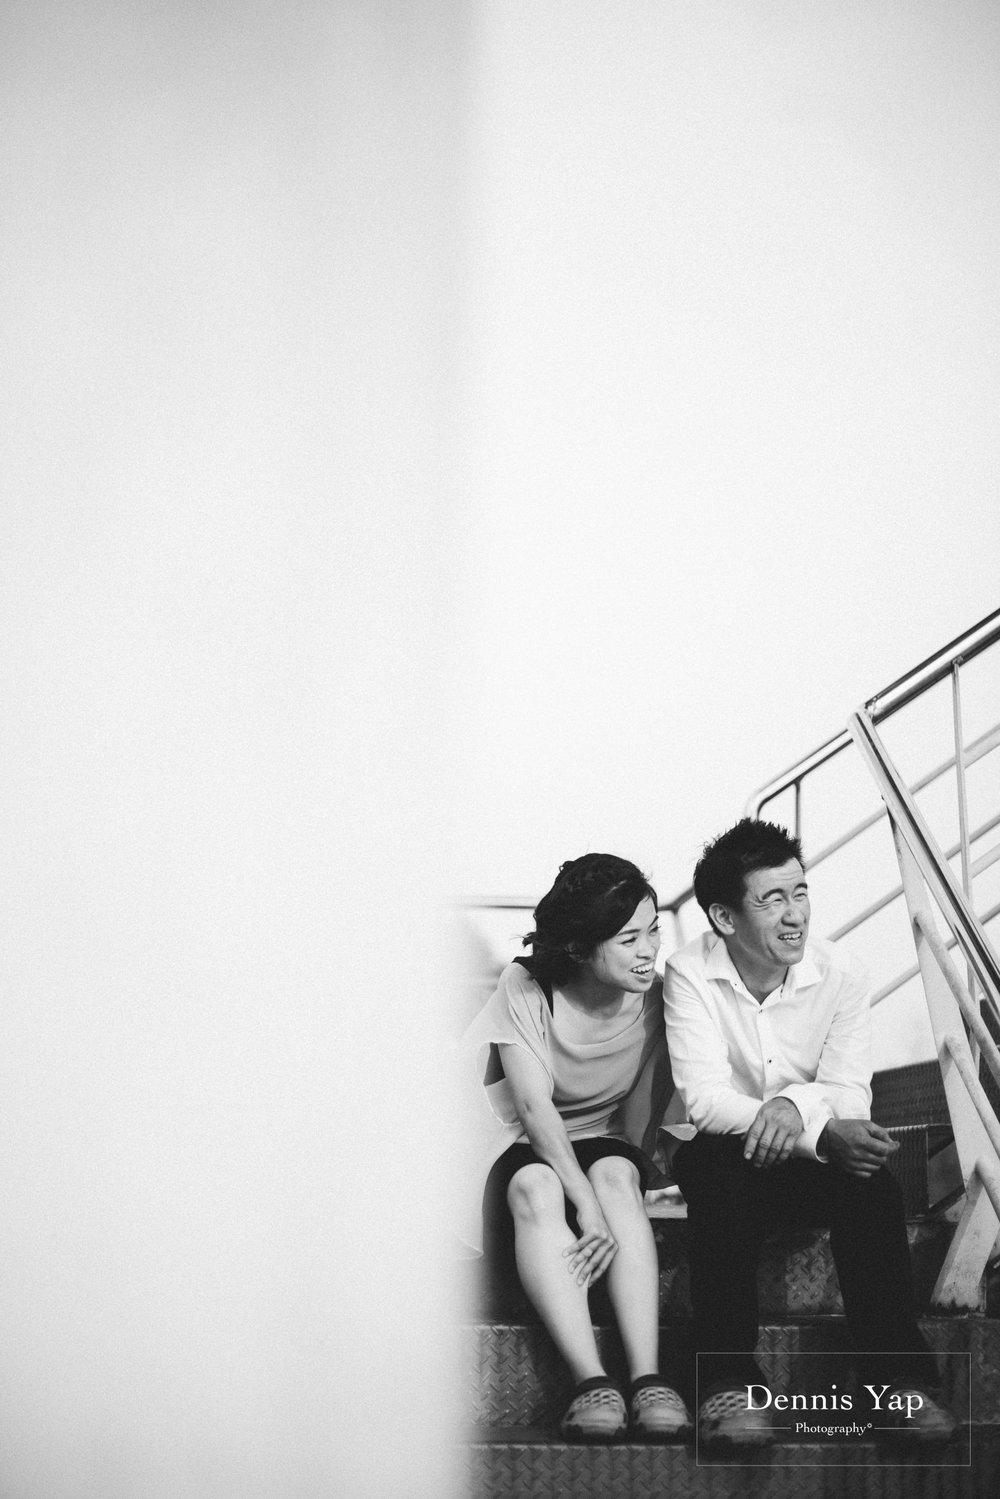 ping yi love celebration portrait dennis yap photography -5.jpg